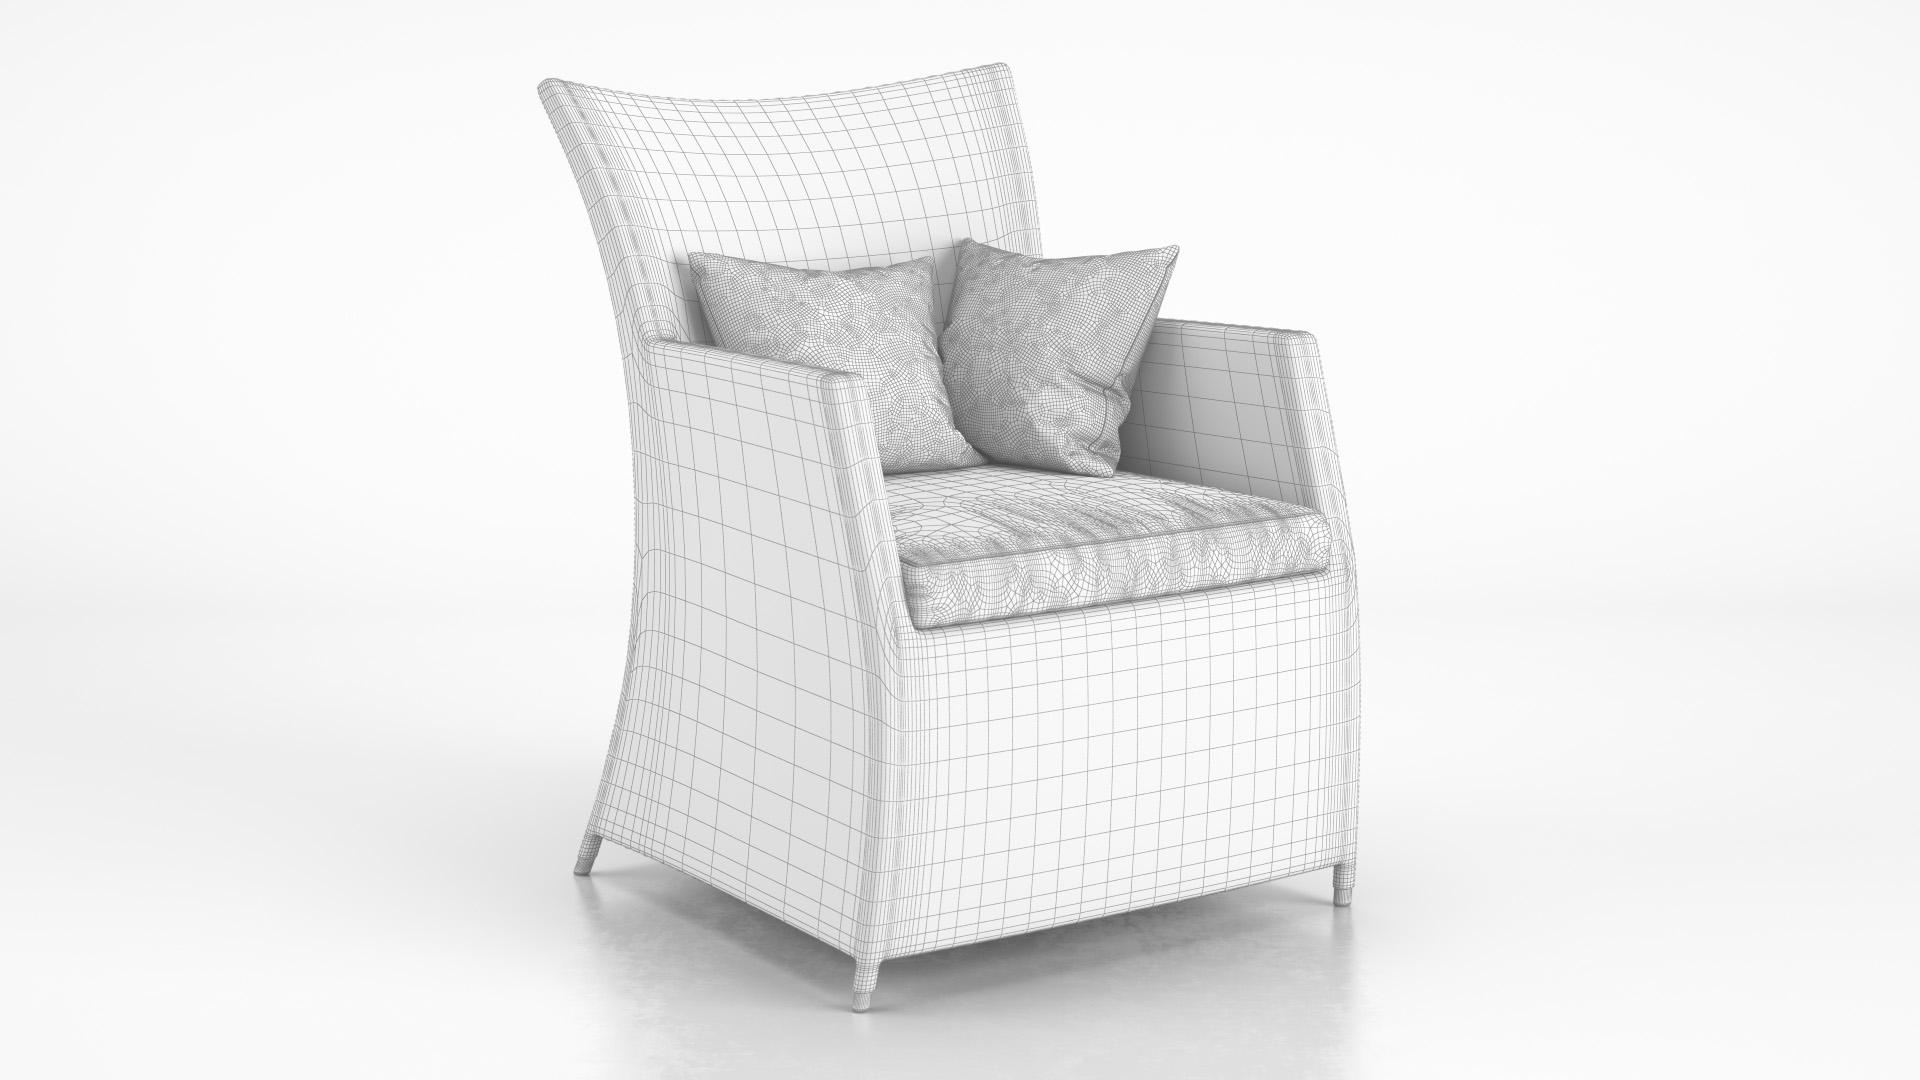 U-zit_Chair_CF-21-DB_WhiteSet_01_wire_0000